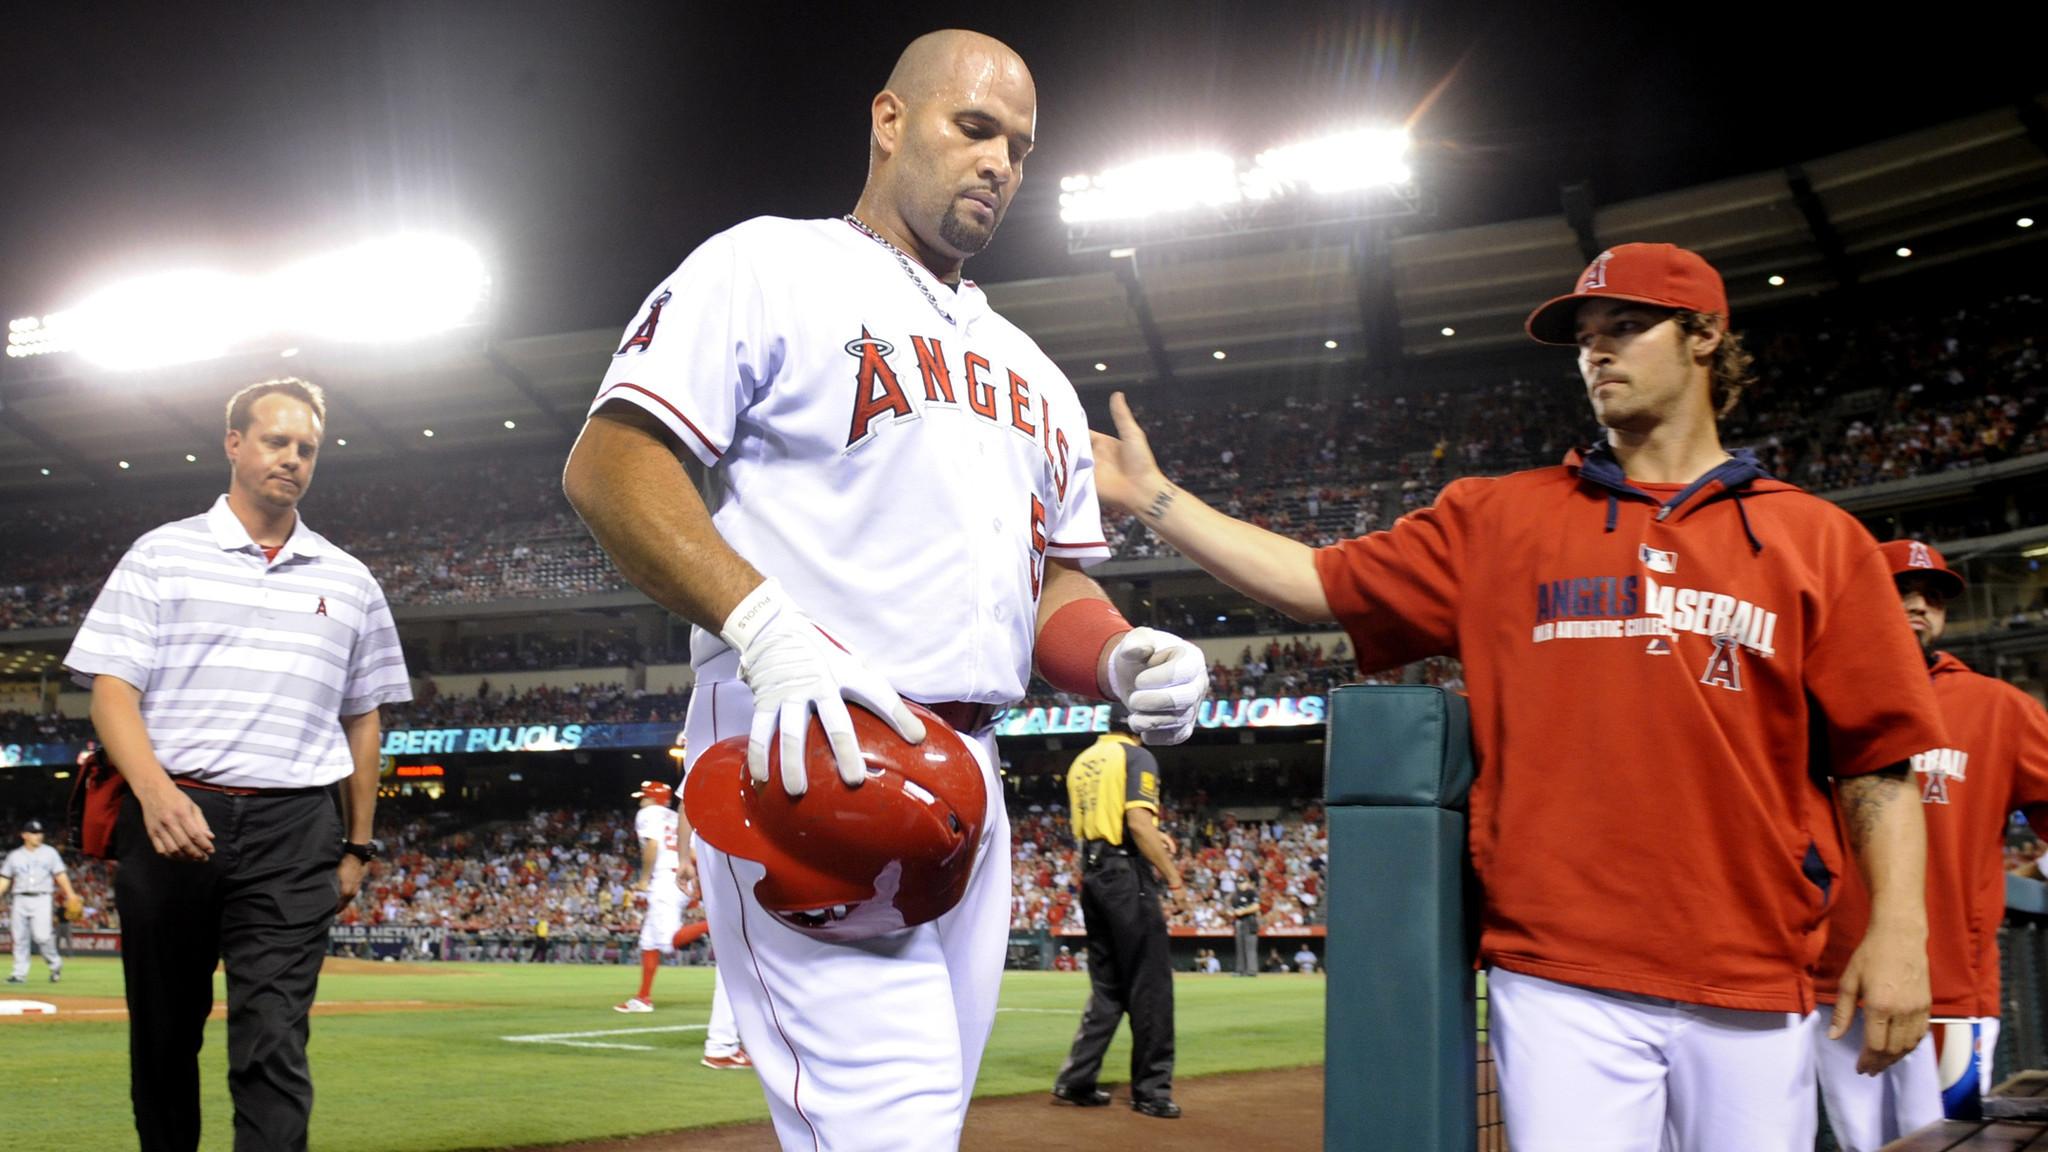 Angels slugger Albert Pujols leaves game because of hamstring cramp